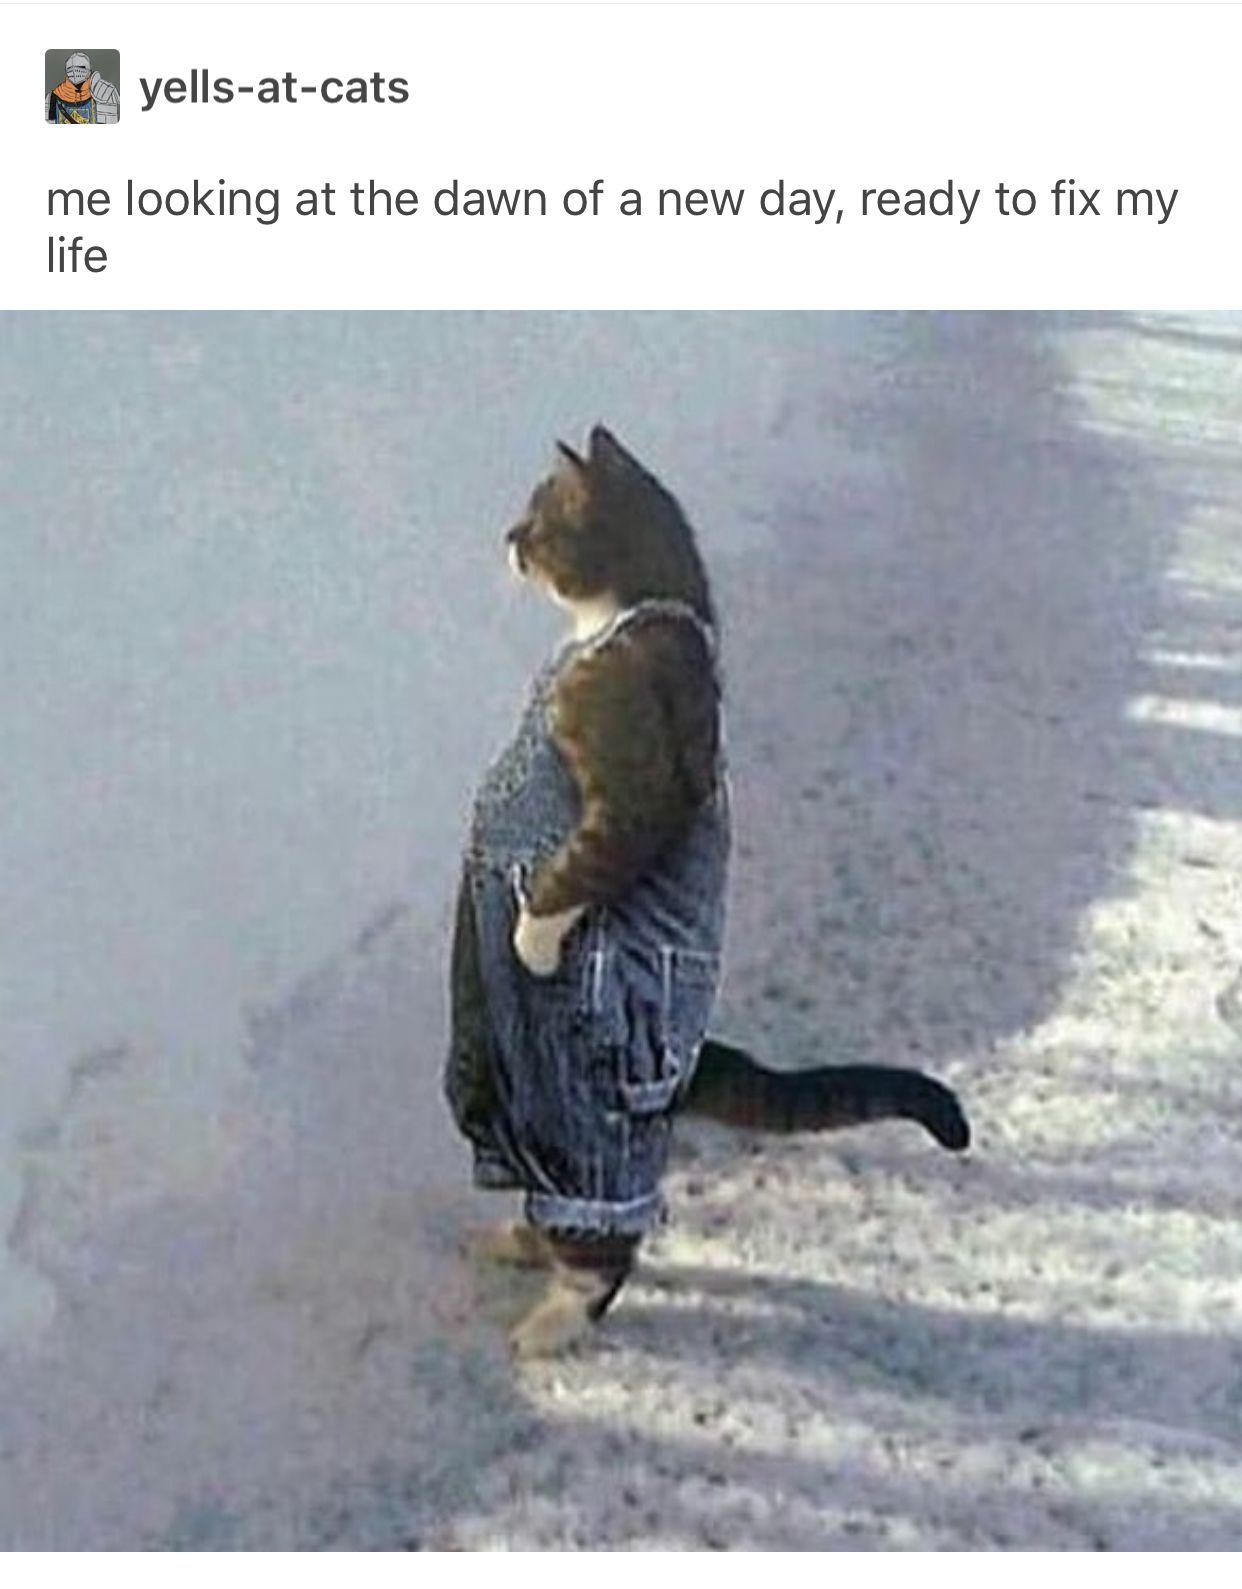 Pin By Leni On Funny Warrior Cats Funny Warrior Cat Memes Warrior Cats Comics